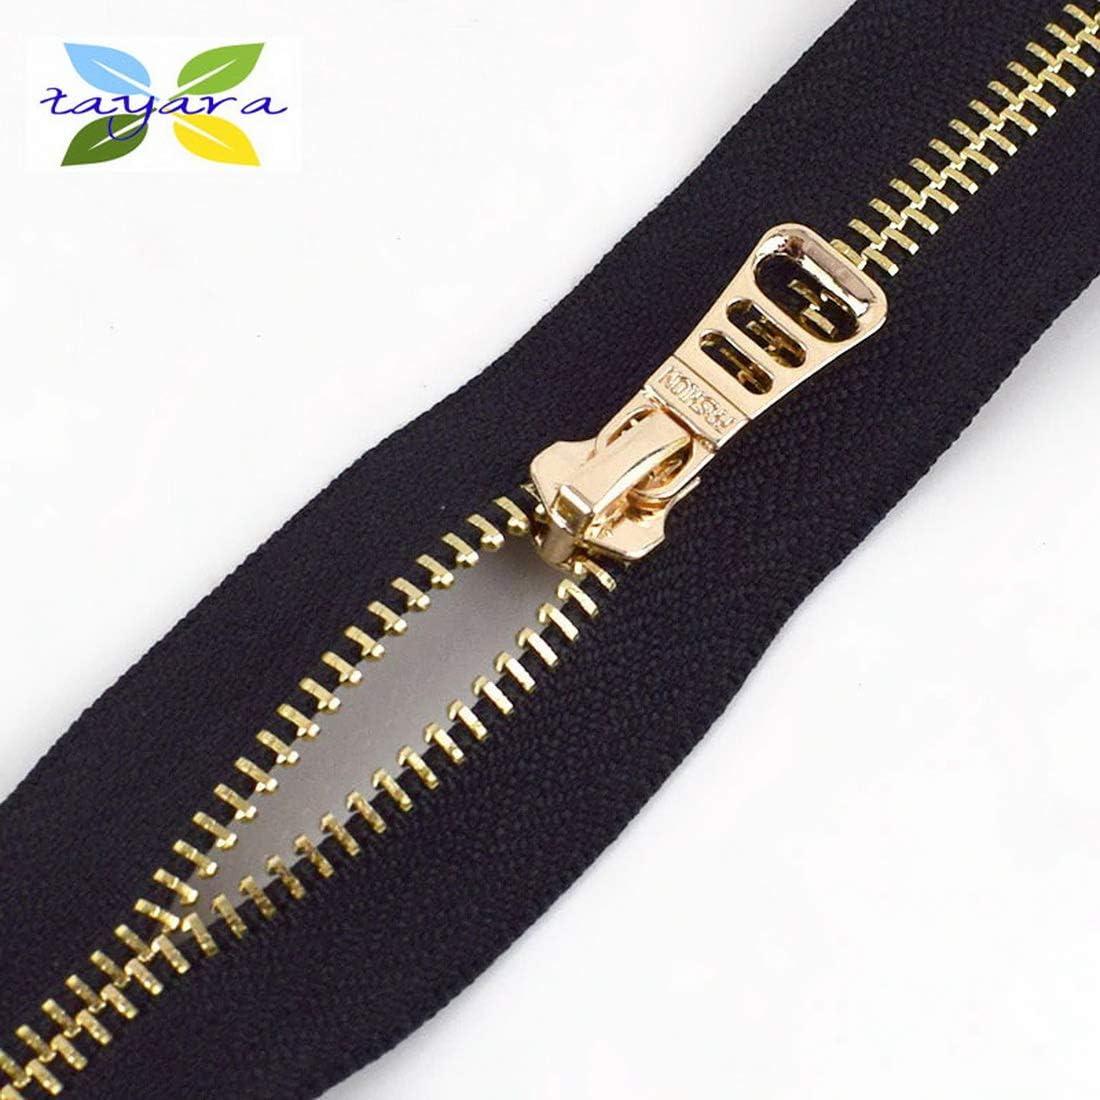 5 Pcs #3 #5 #8 #10 Fix Zipper Slider Repair Kit Fastening Sewing Tailor Clothing